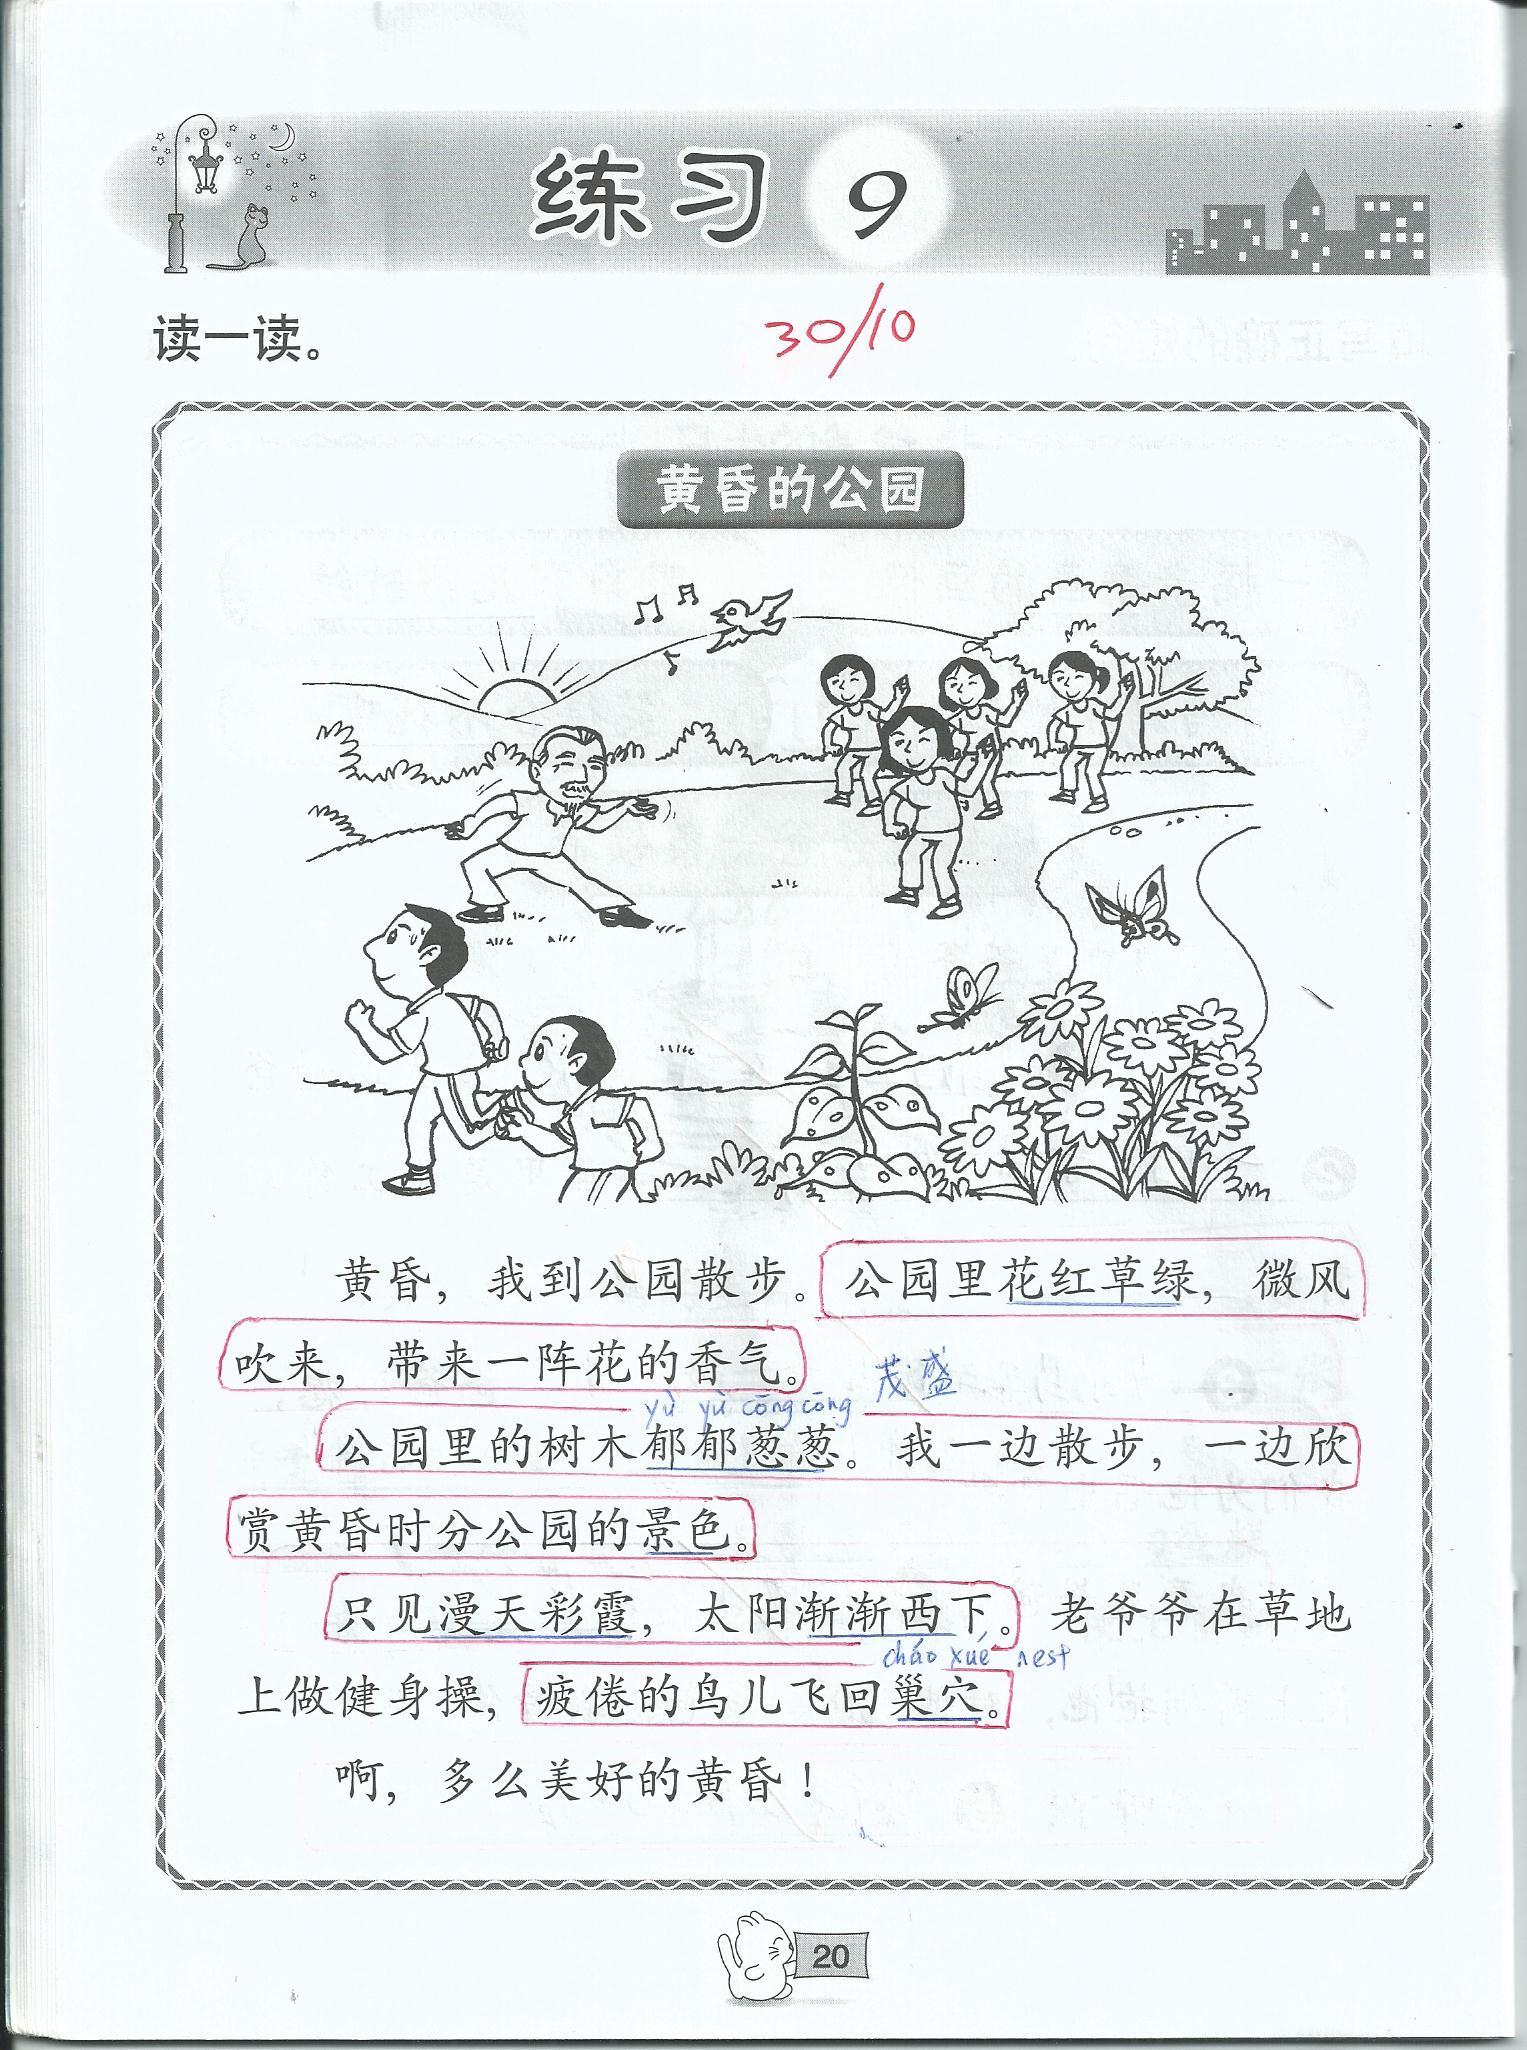 005 Writing00031 Chinese Essay Amazing Art Topics Vce Formats Sheet Full